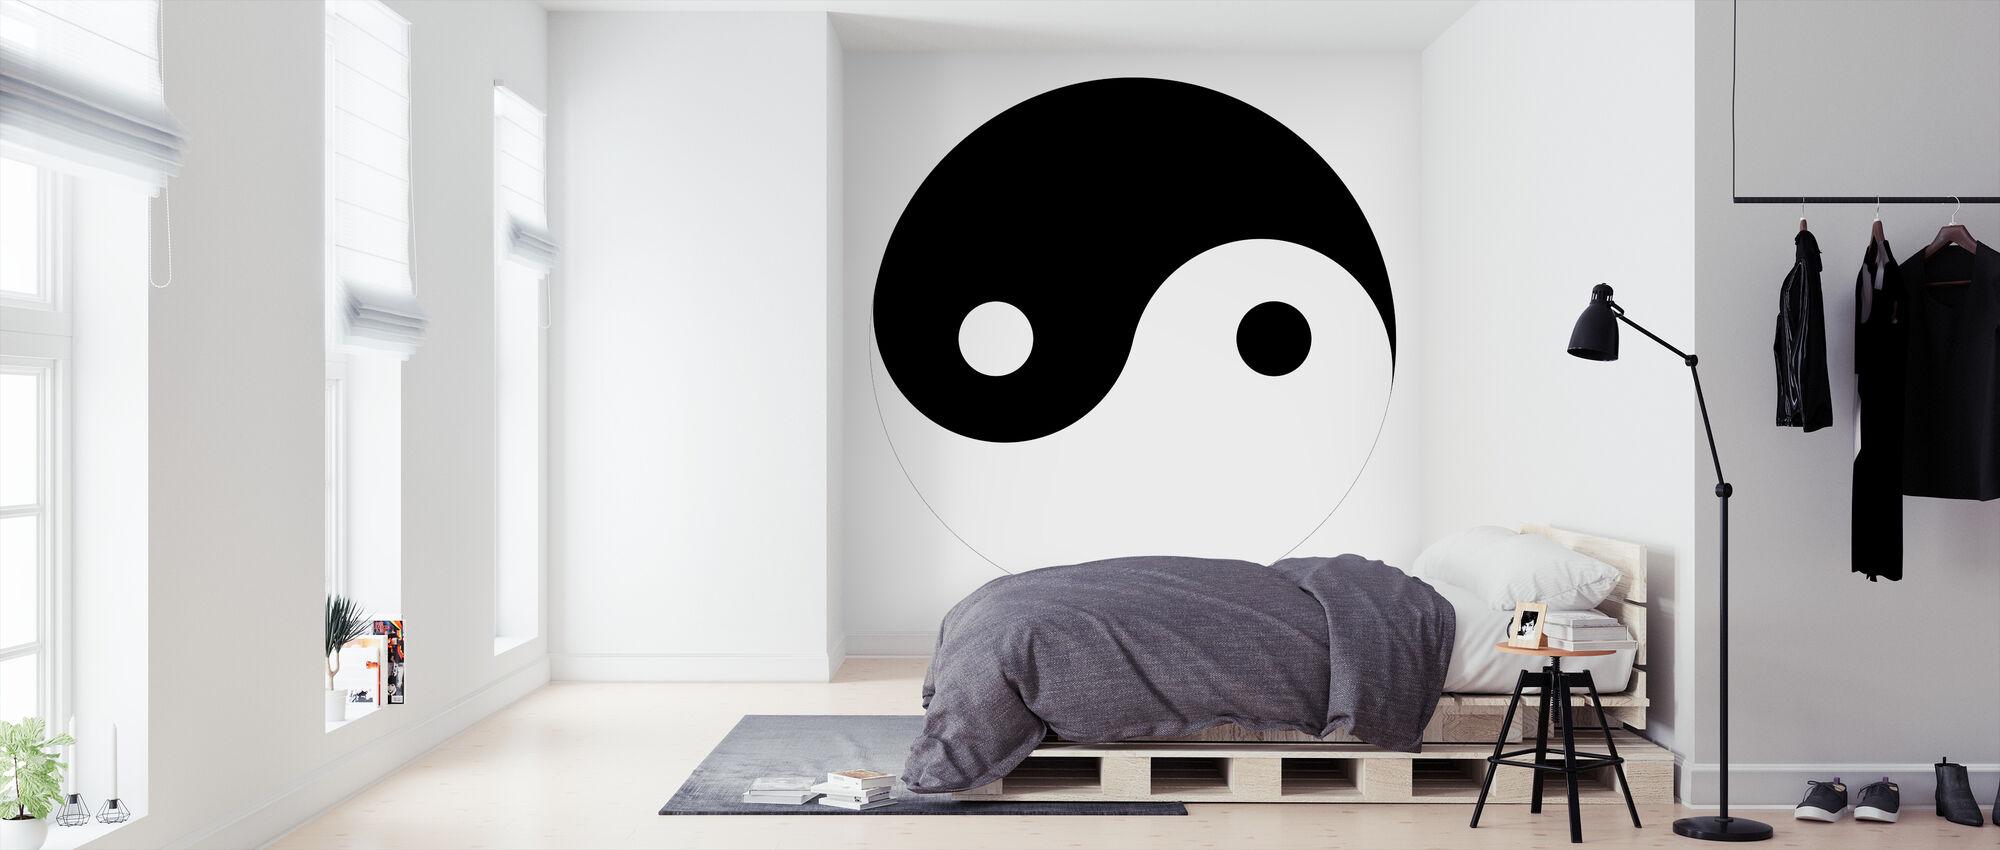 Yin-Yang - Wallpaper - Bedroom